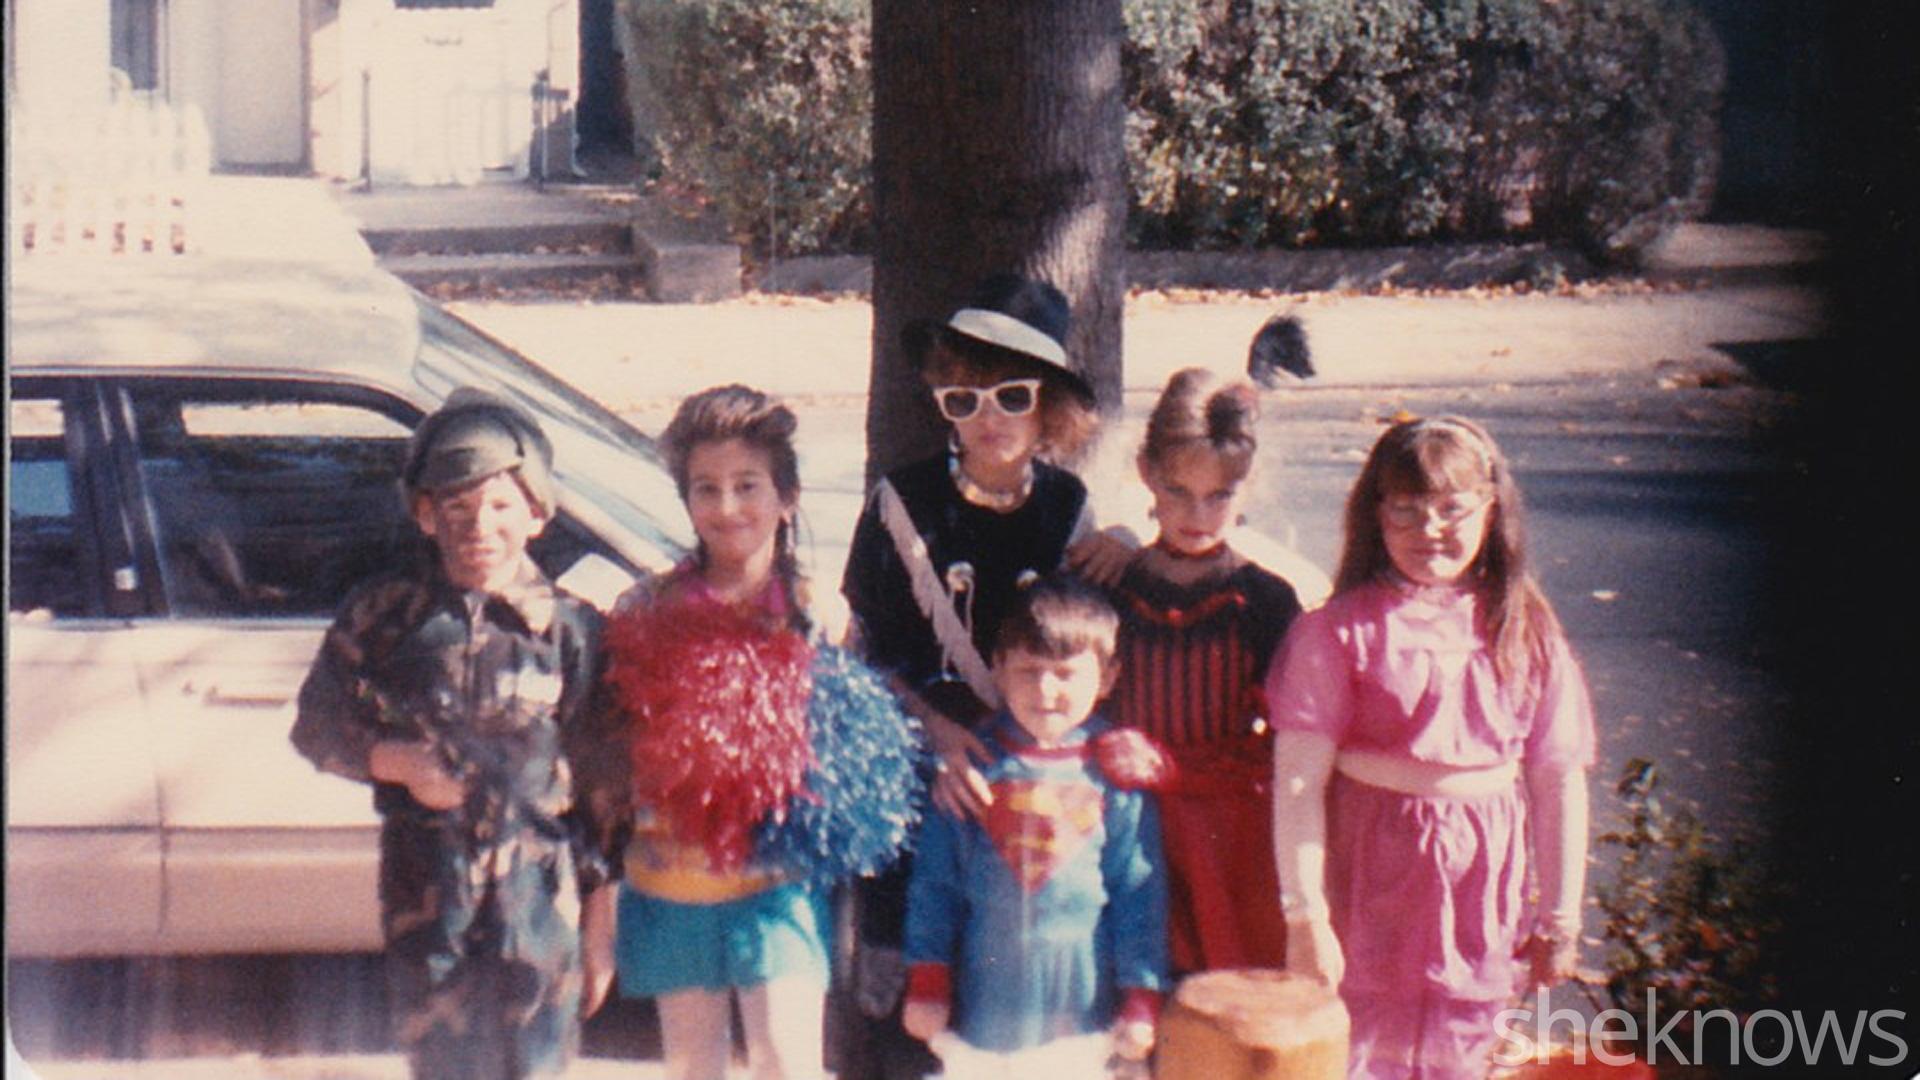 Halloween-Circa-1980s-SheKnows-Article